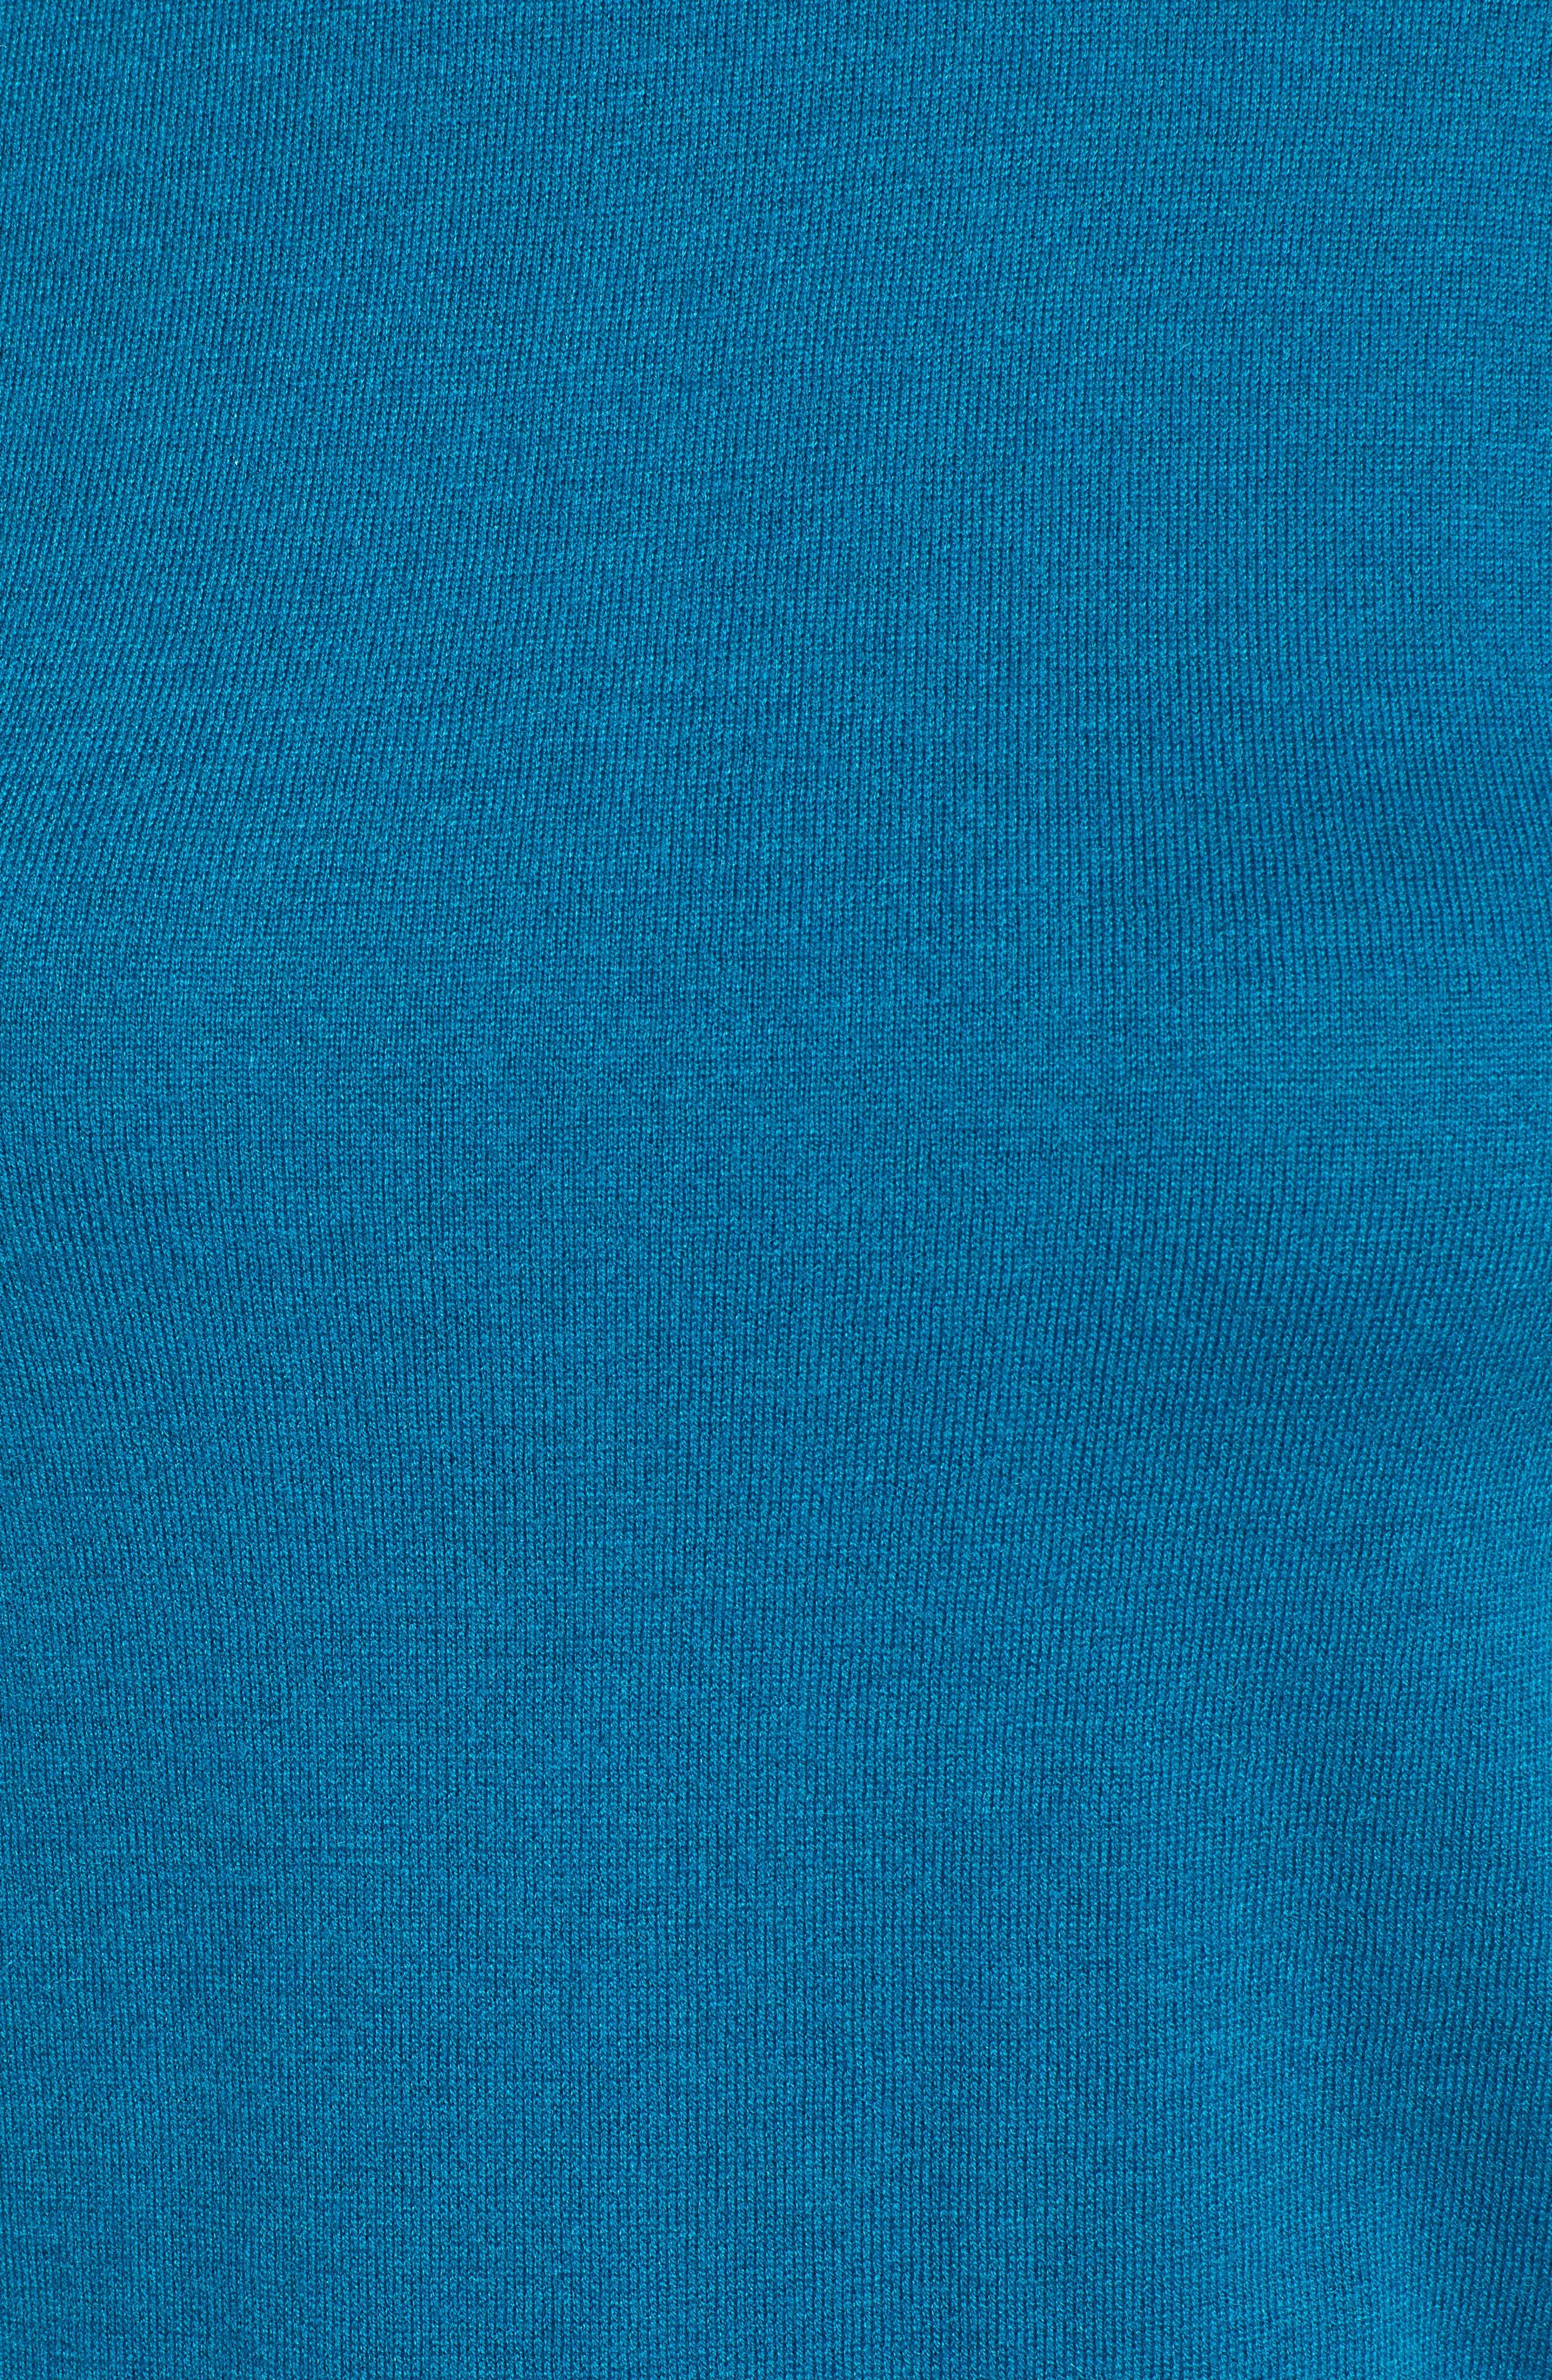 Sheer Sleeve Turtleneck Sweater,                             Alternate thumbnail 5, color,                             449